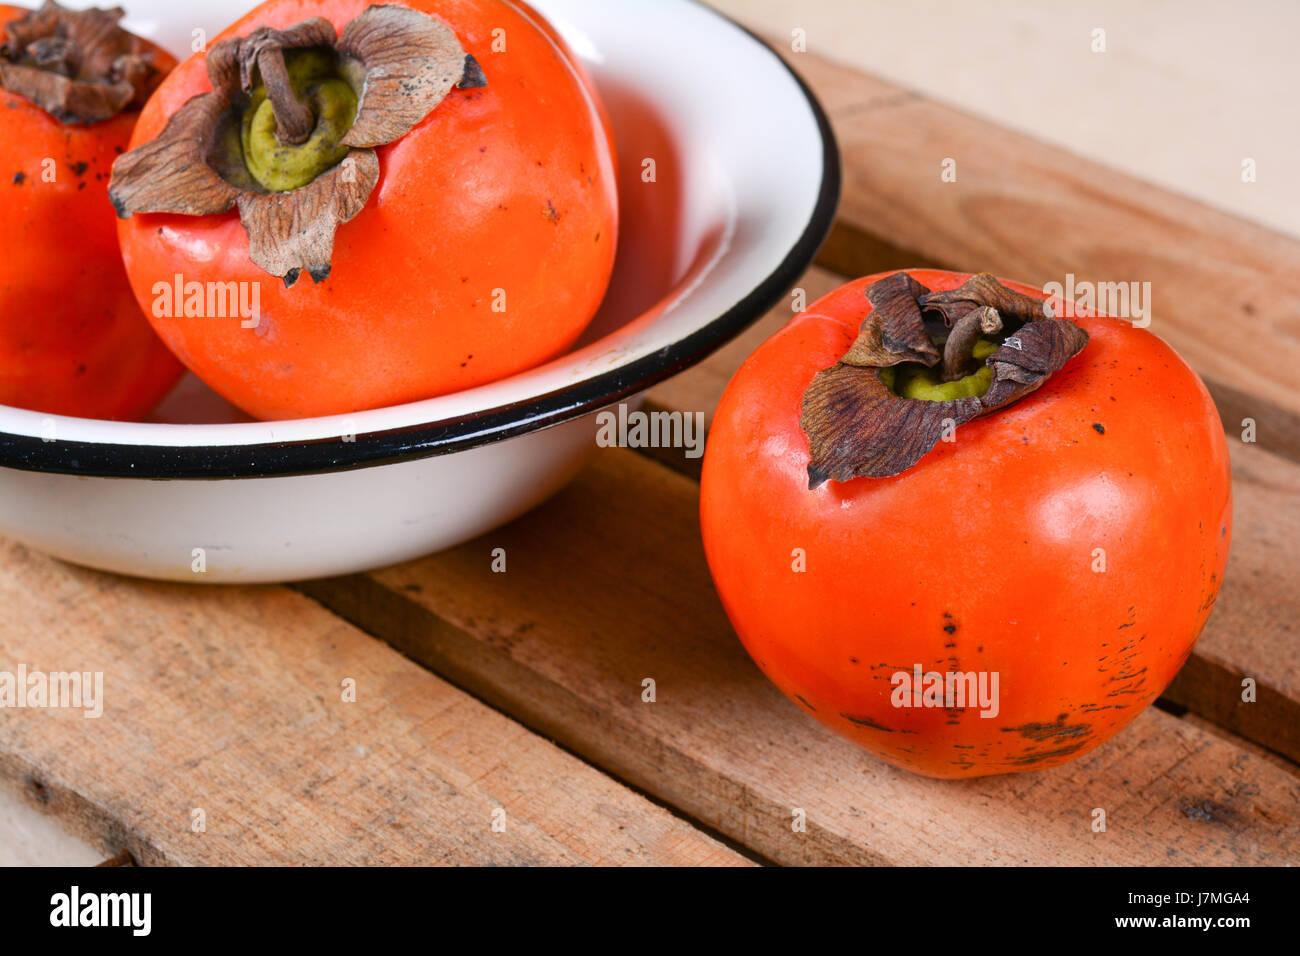 Persimmon fruit - Stock Image